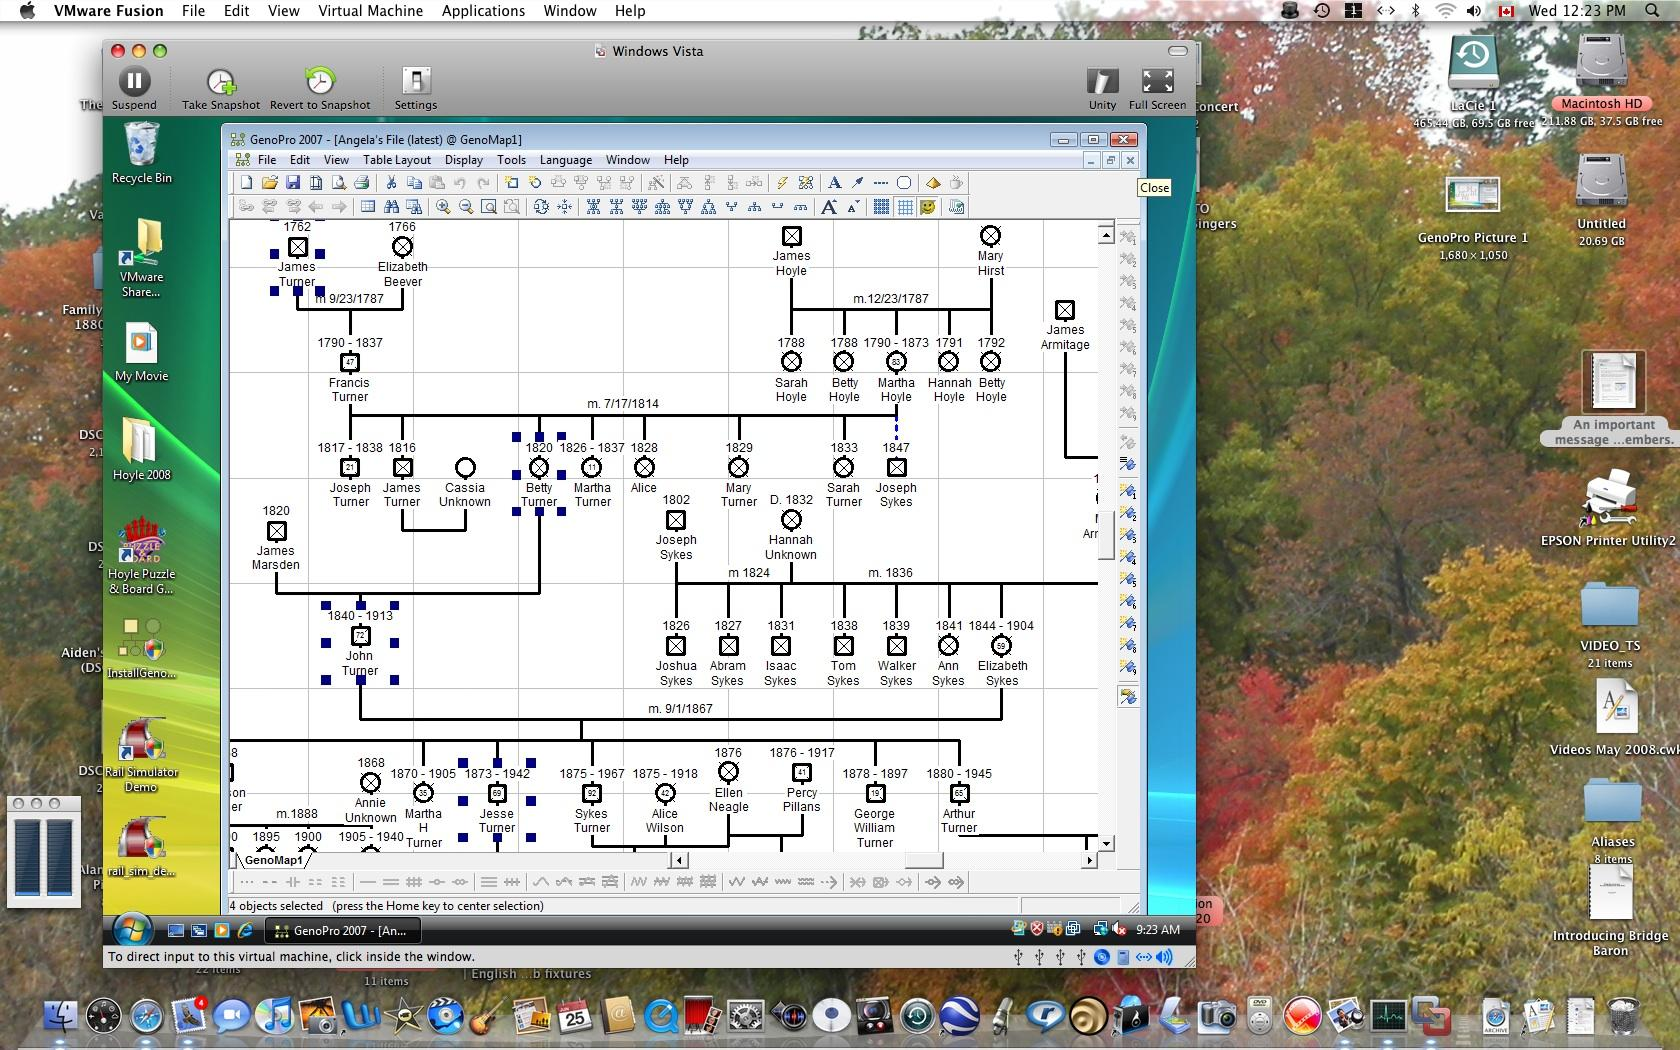 MacFamilyTree 8 - Genealogy for your Mac